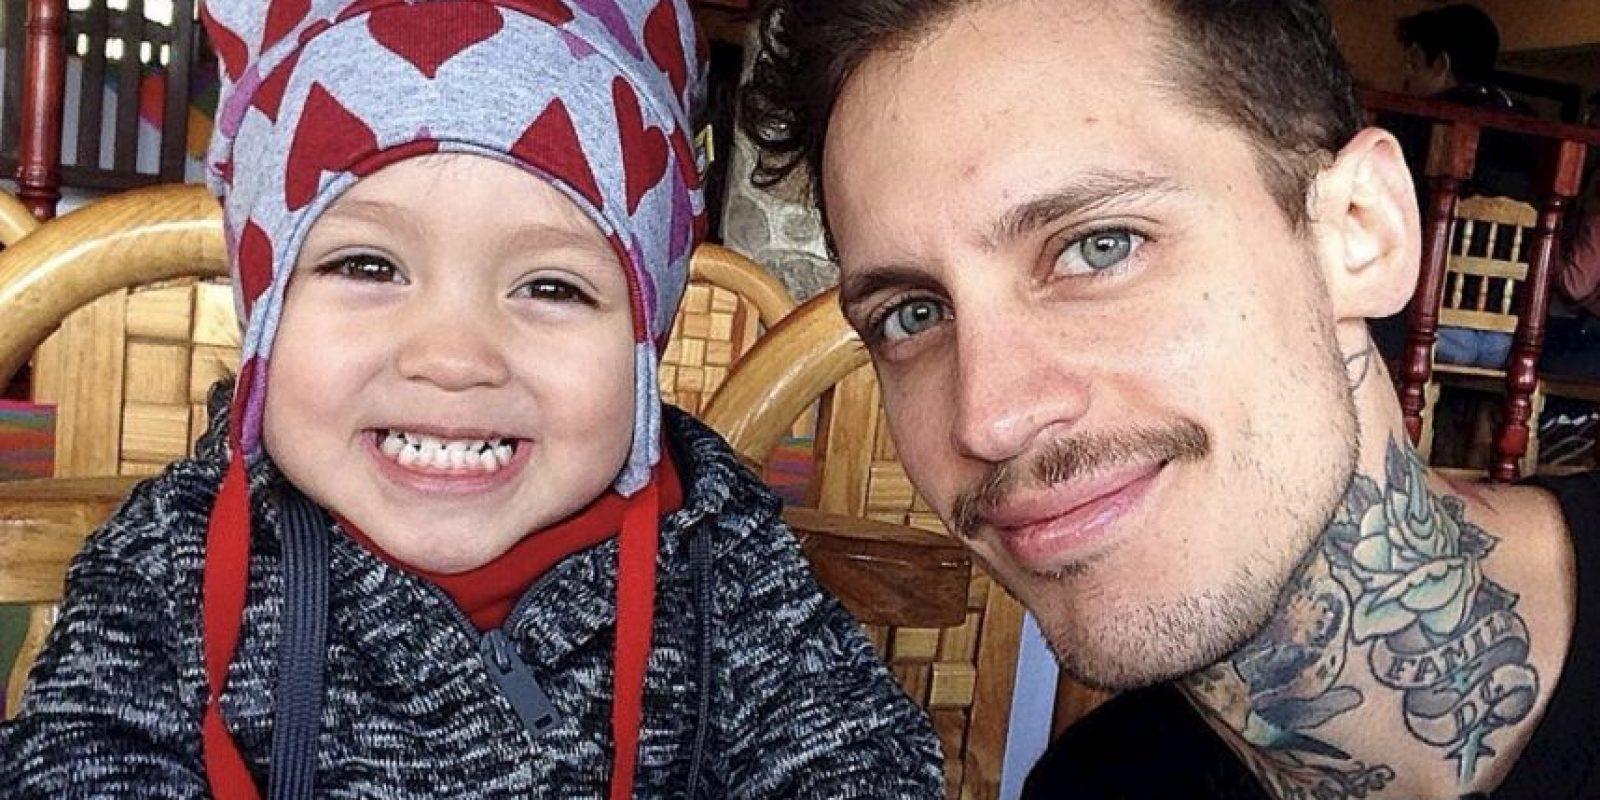 Pablo Holman, exintegrante de Kudai, con su hija Foto:Instagram @pablovonterror